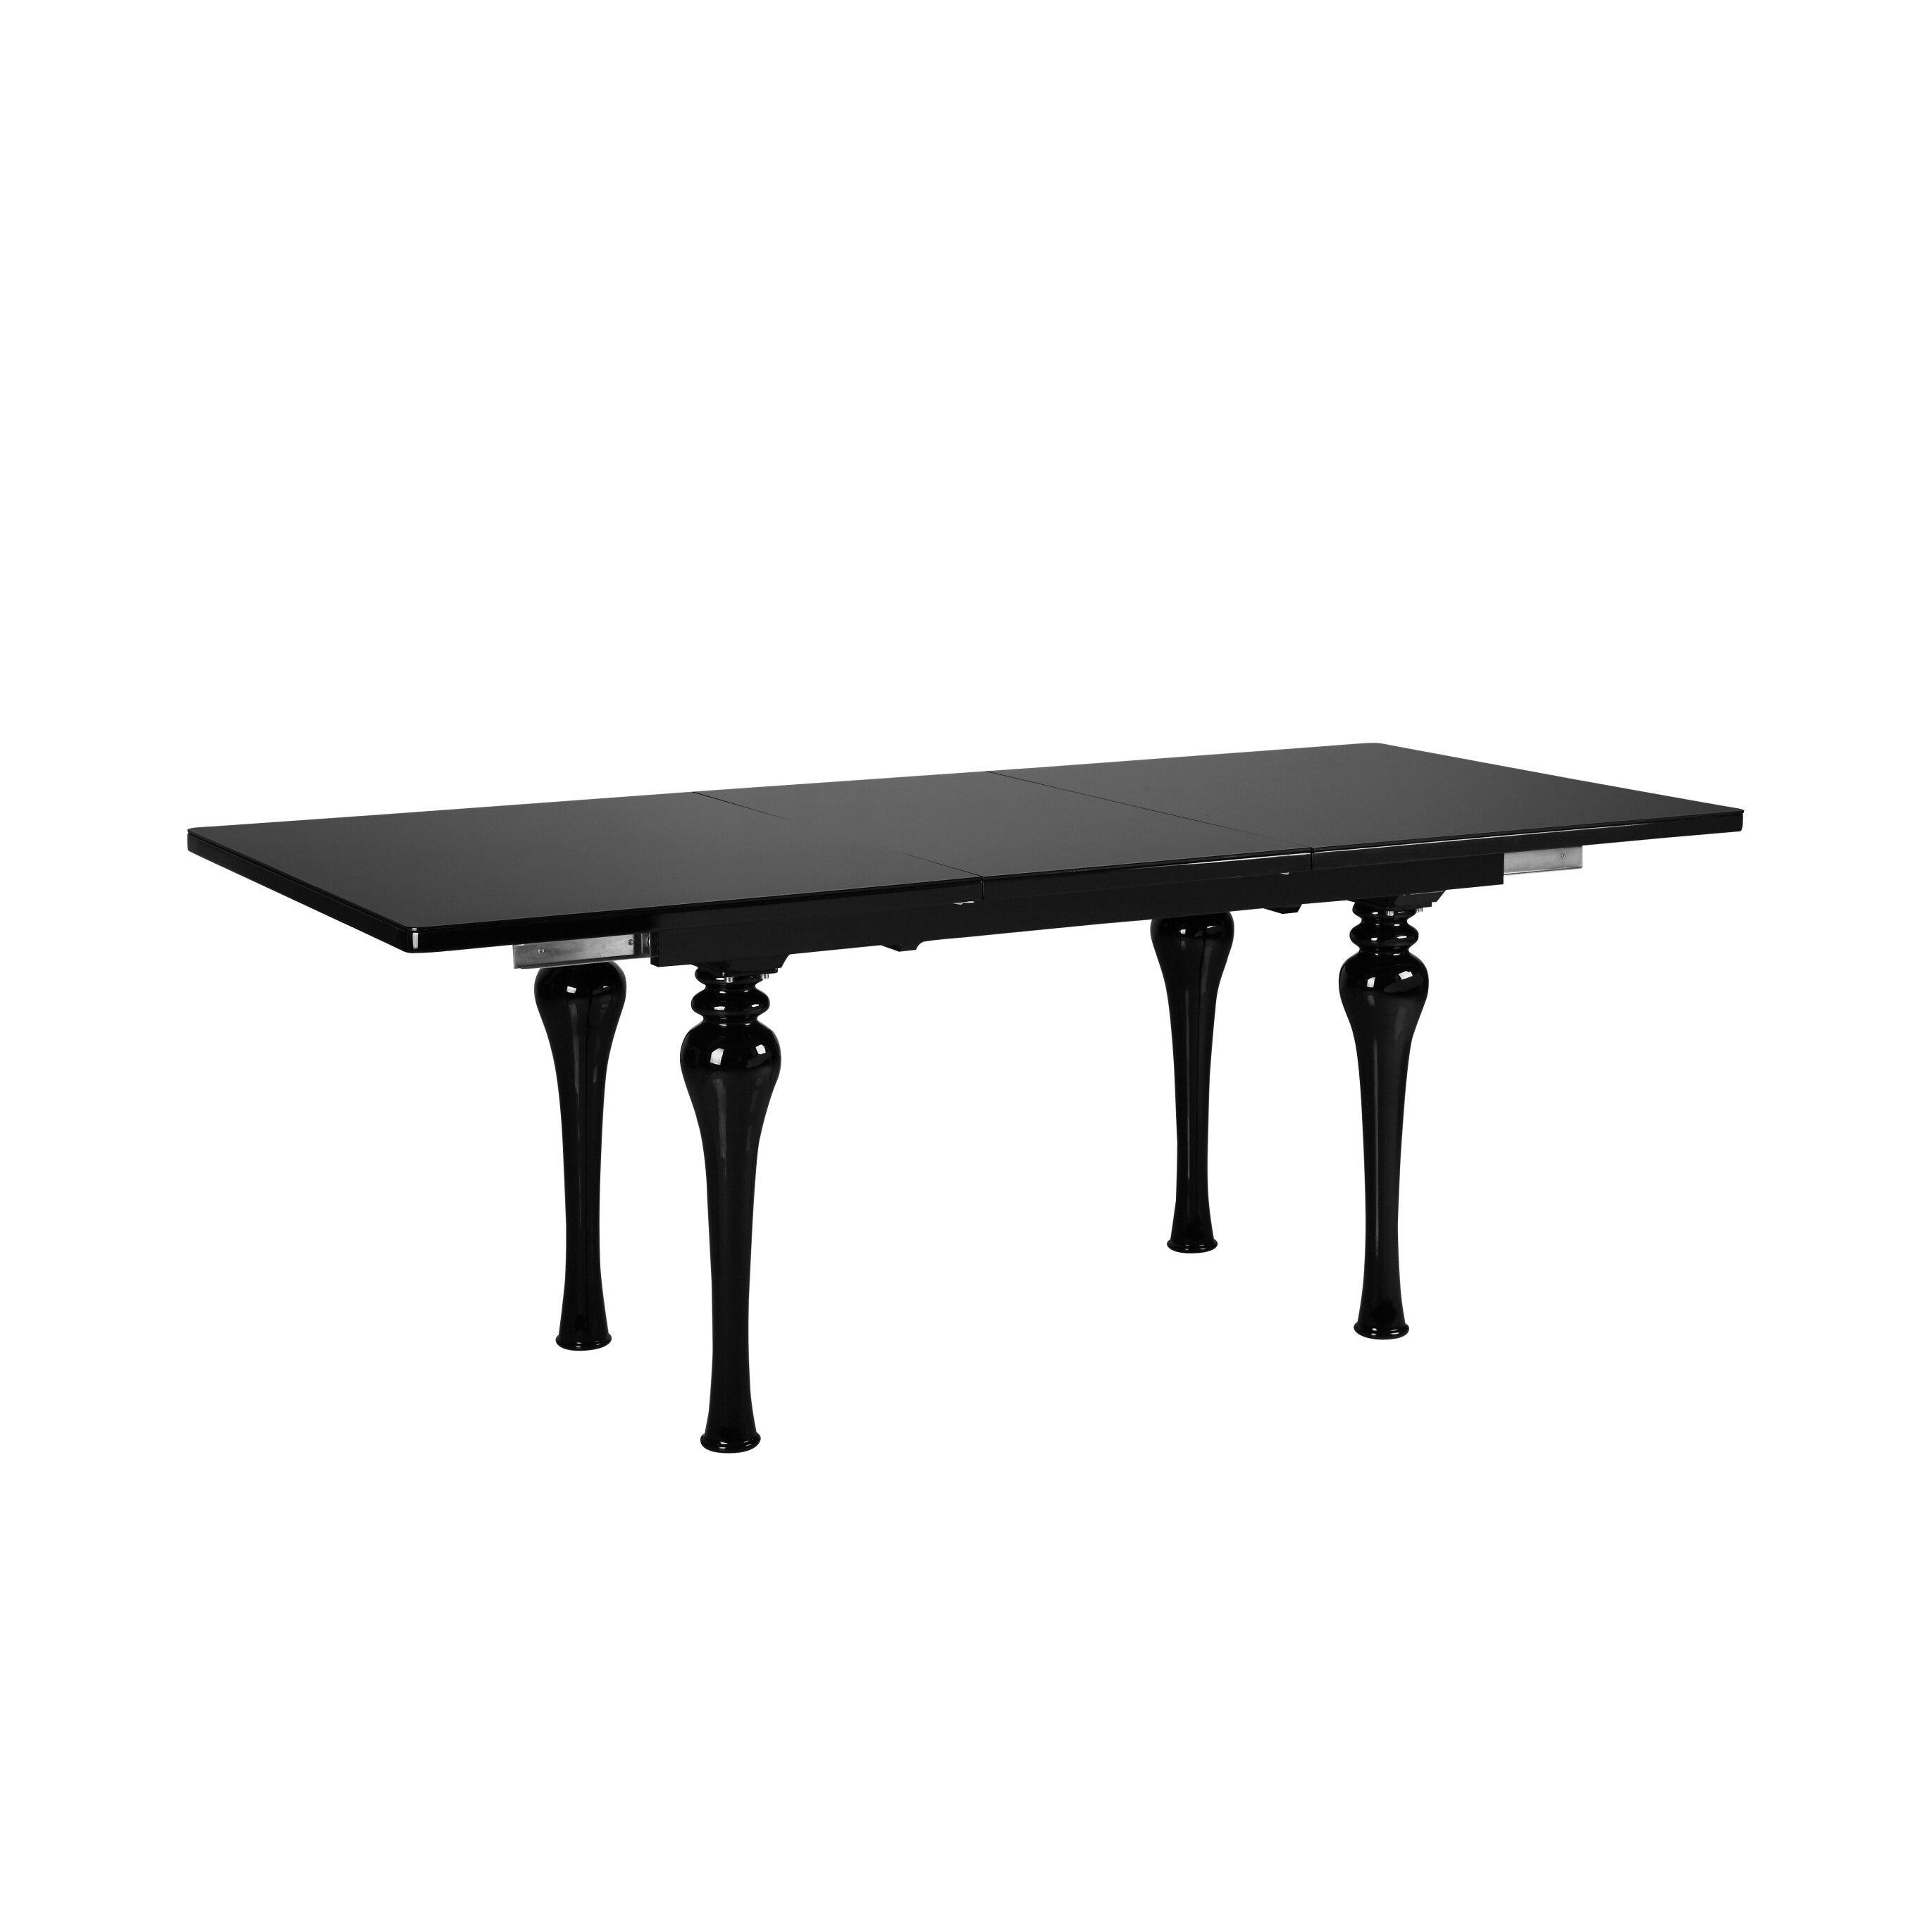 Mercer41 Emeric Extendable Dining Table